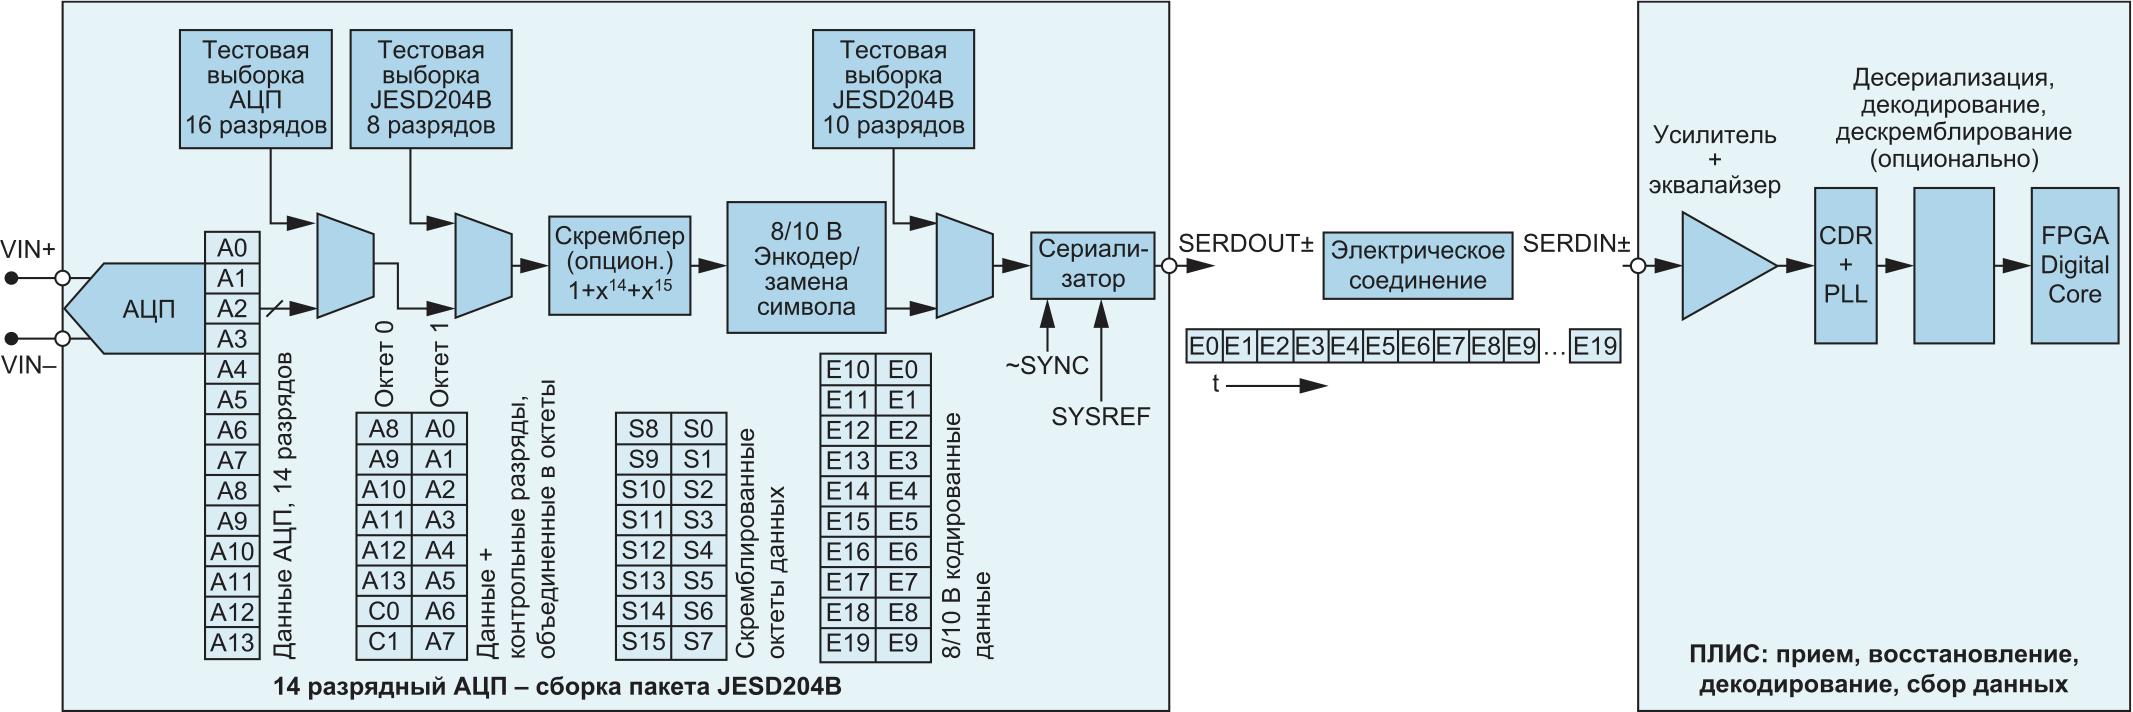 Диаграмма подключения 1 АЦП к ПЛИС по одному каналу JESD204B